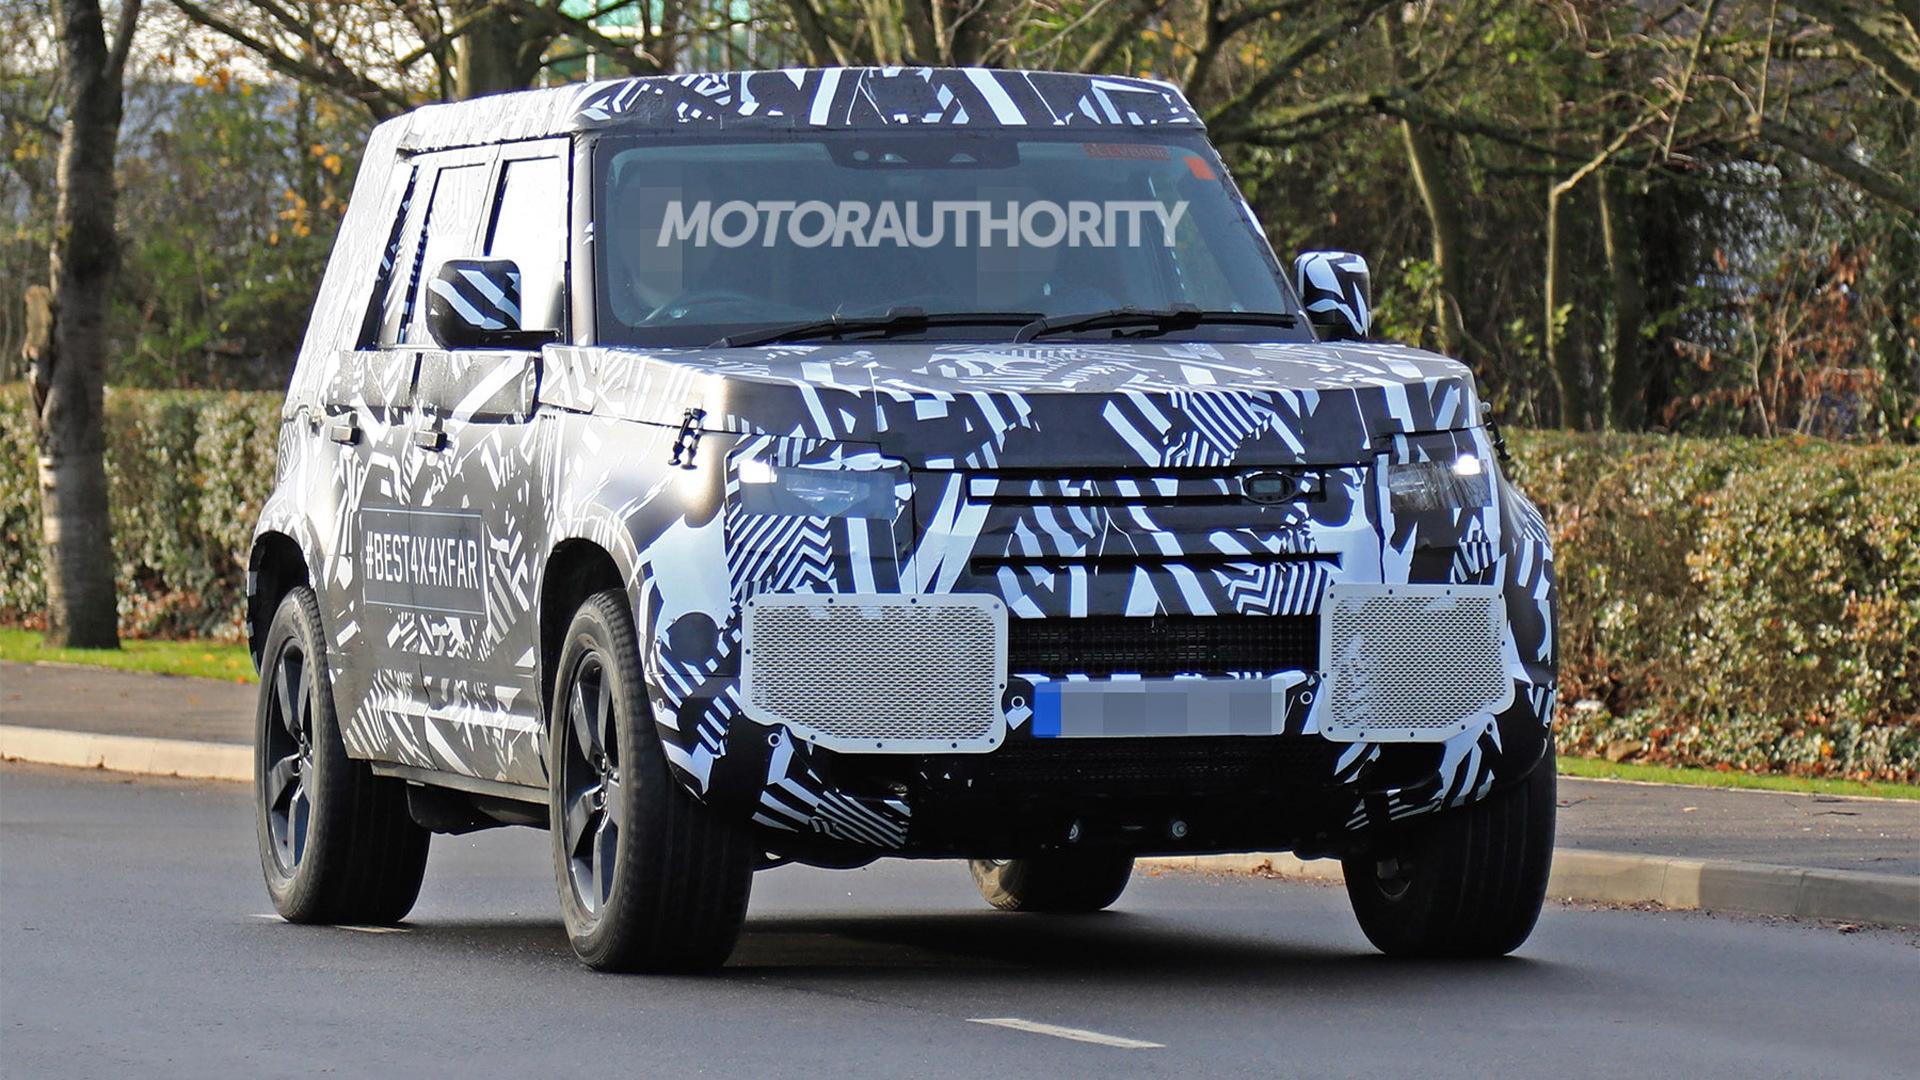 2021 Land Rover Defender spy shots - Image via S. Baldauf/SB-Medien